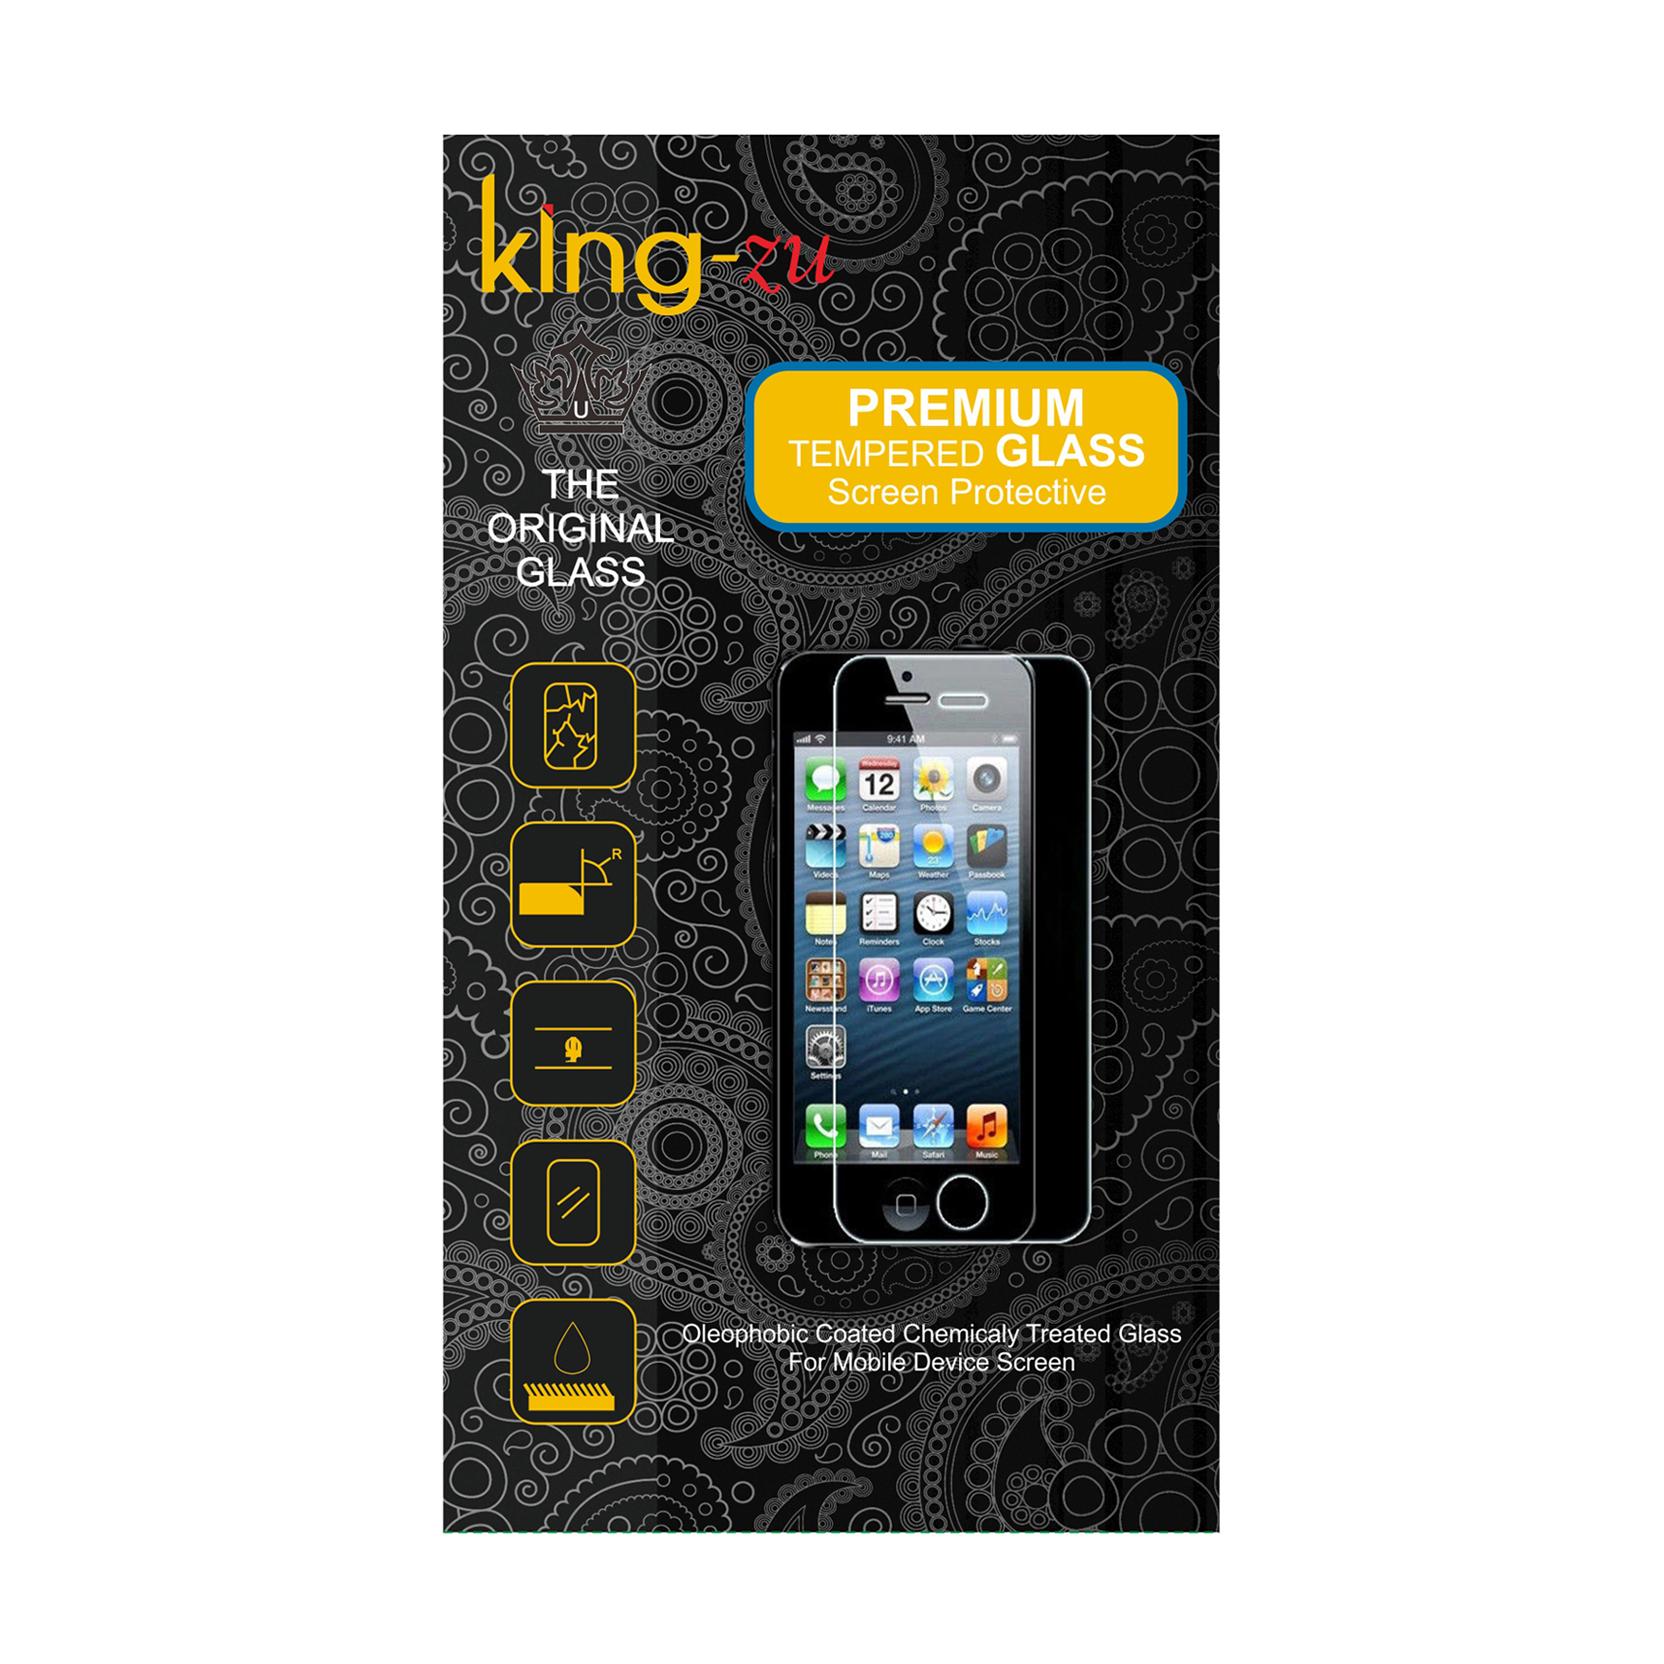 Spesifikasi King Zu Tempered Glass For Samsung Galaxy Note Edge Harga murah Rp 68,000. Beli & dapatkan diskonnya.